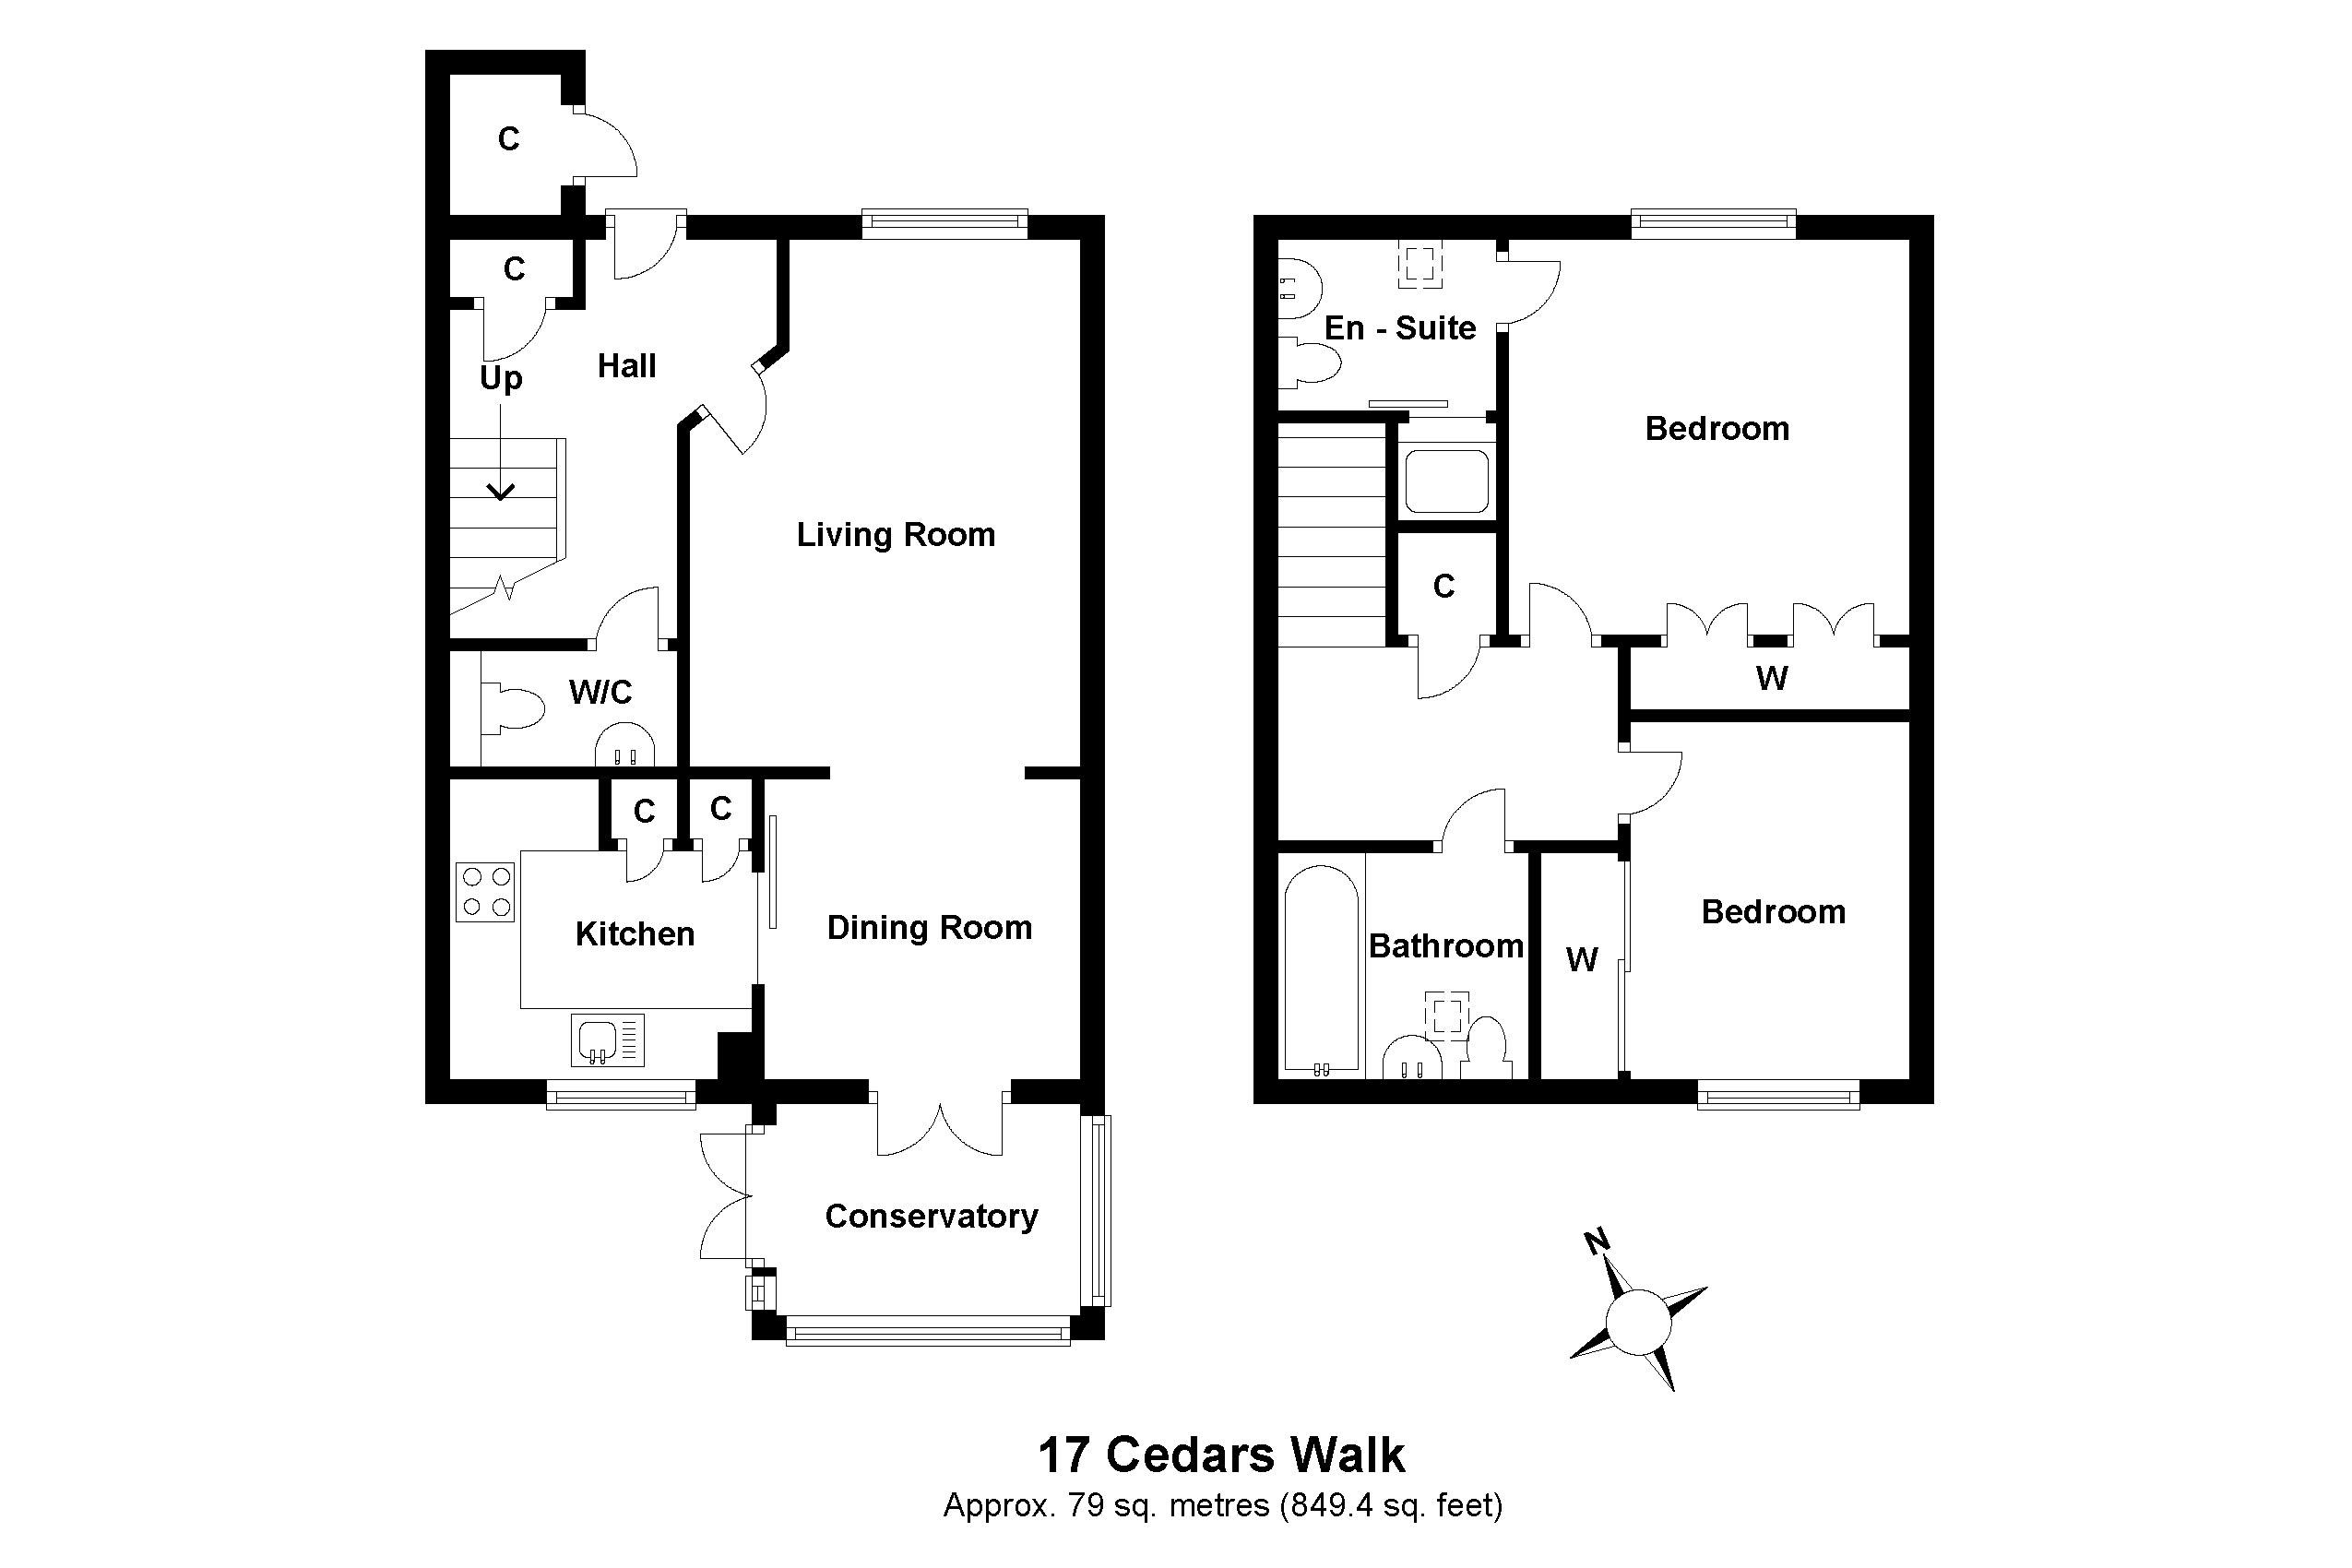 17 Cedars Walk Floorplan